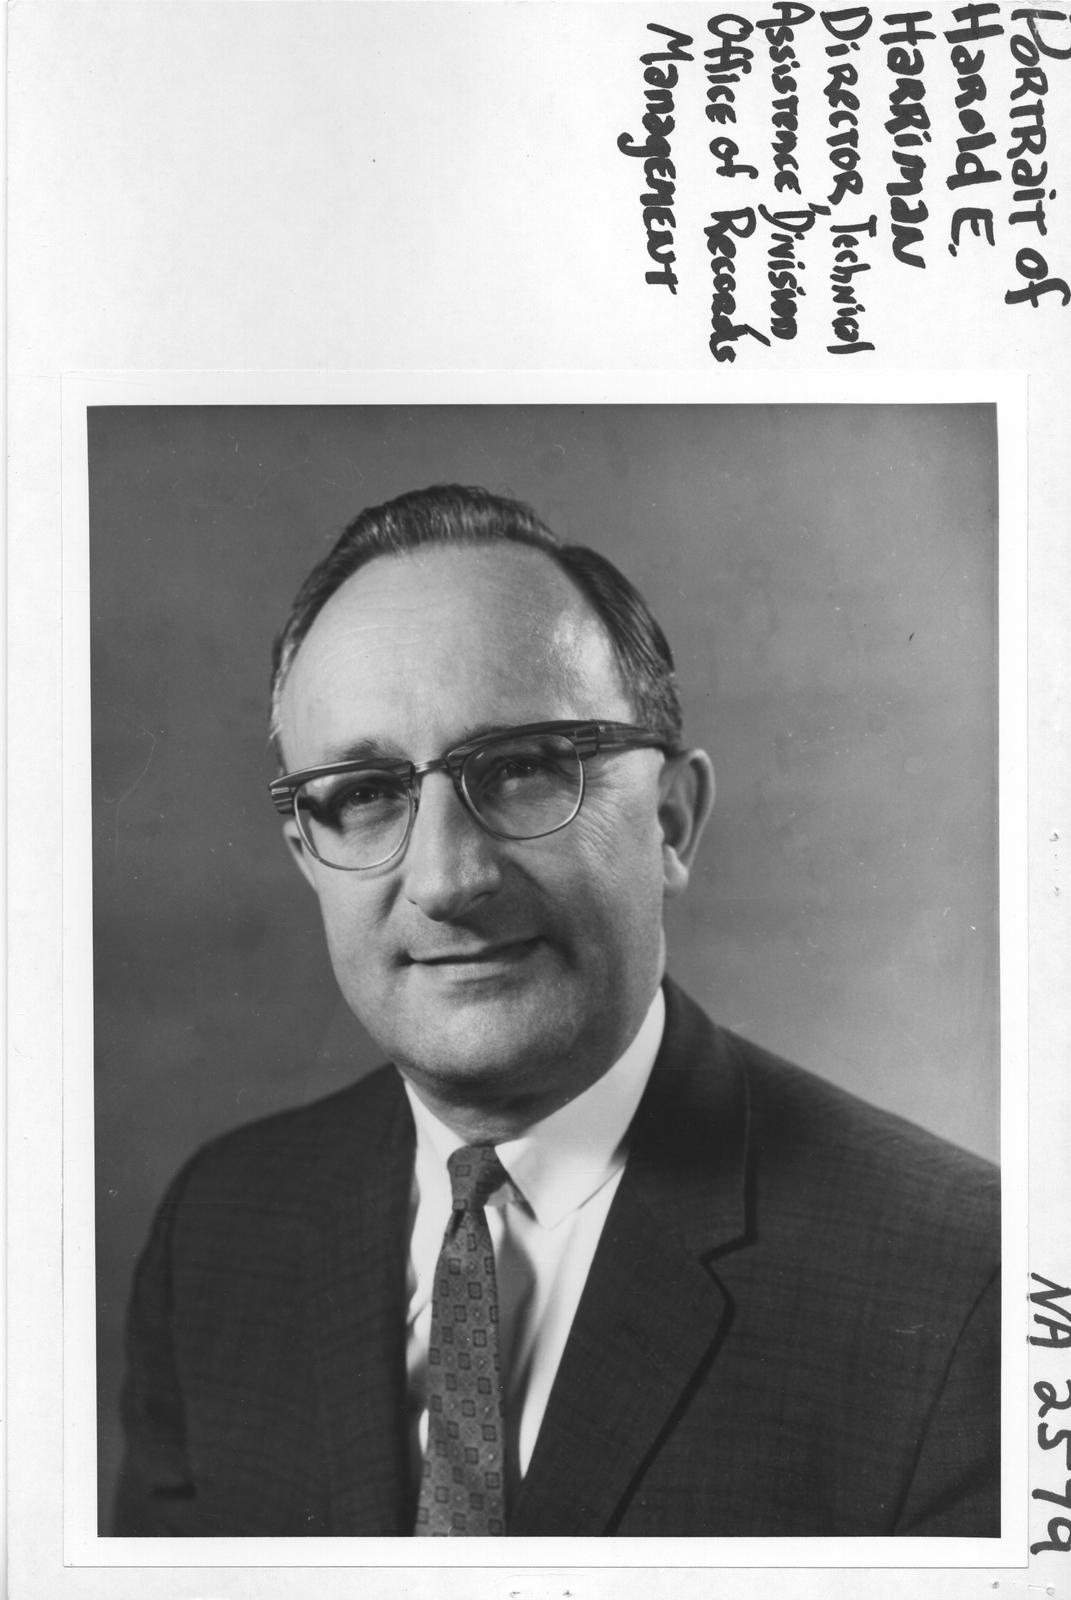 Portrait of Harold E. Harriman